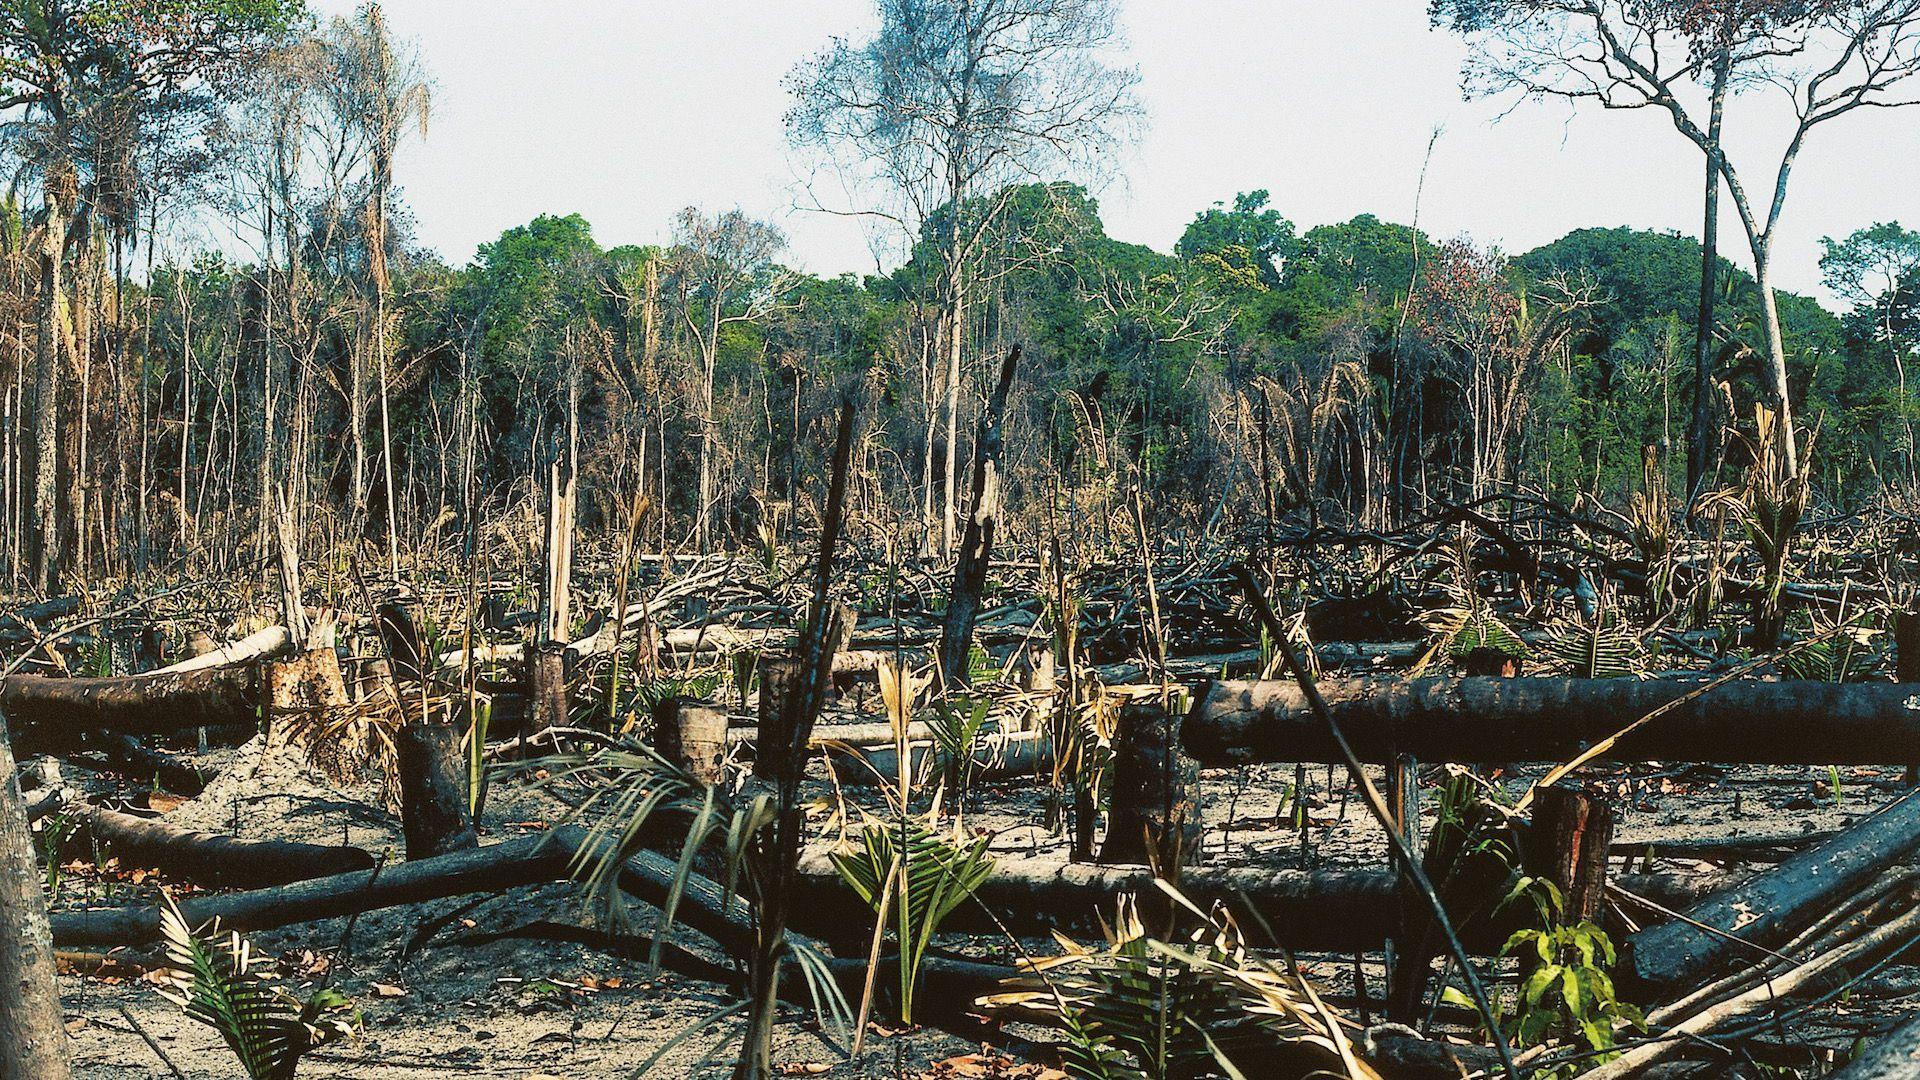 Deforestation in the Amazon rainforest, Brazil / Photo: DeAgostini/Getty Images.